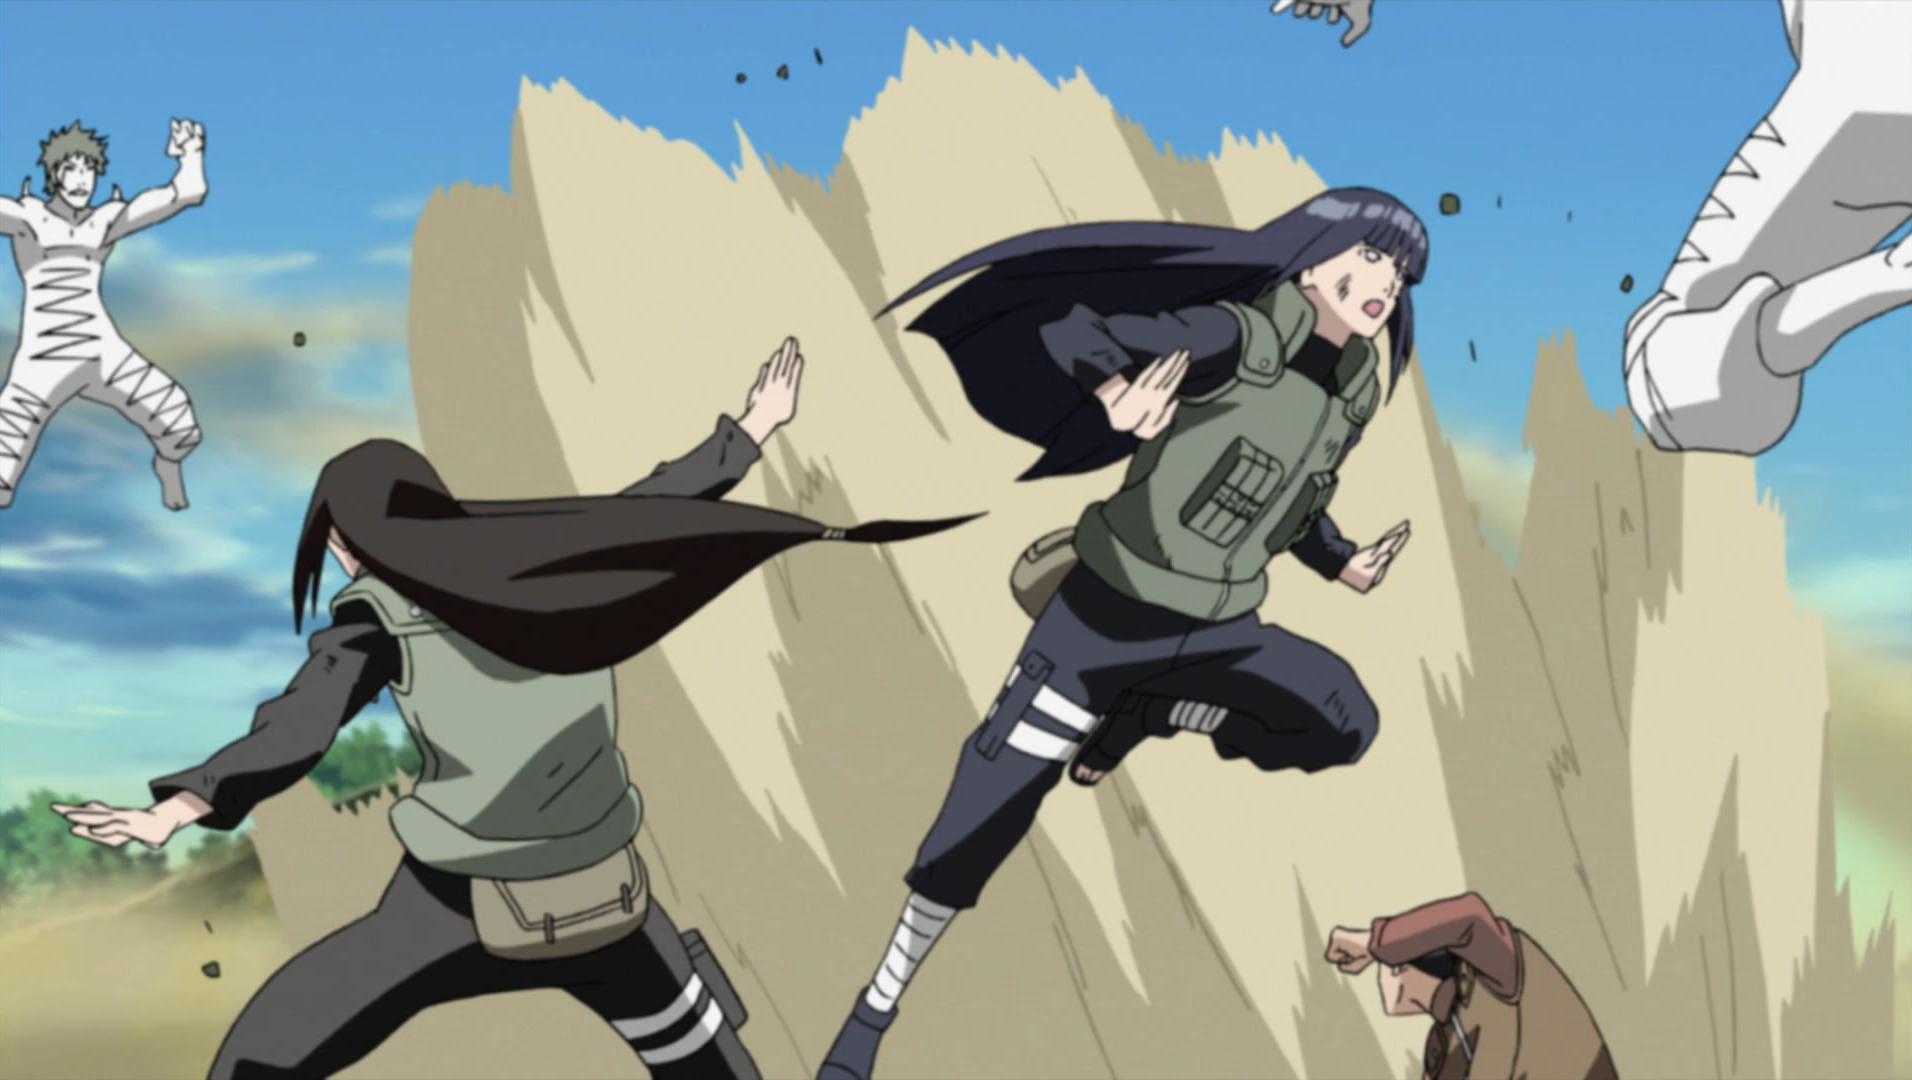 Naruto shippuden episode 306 online dating